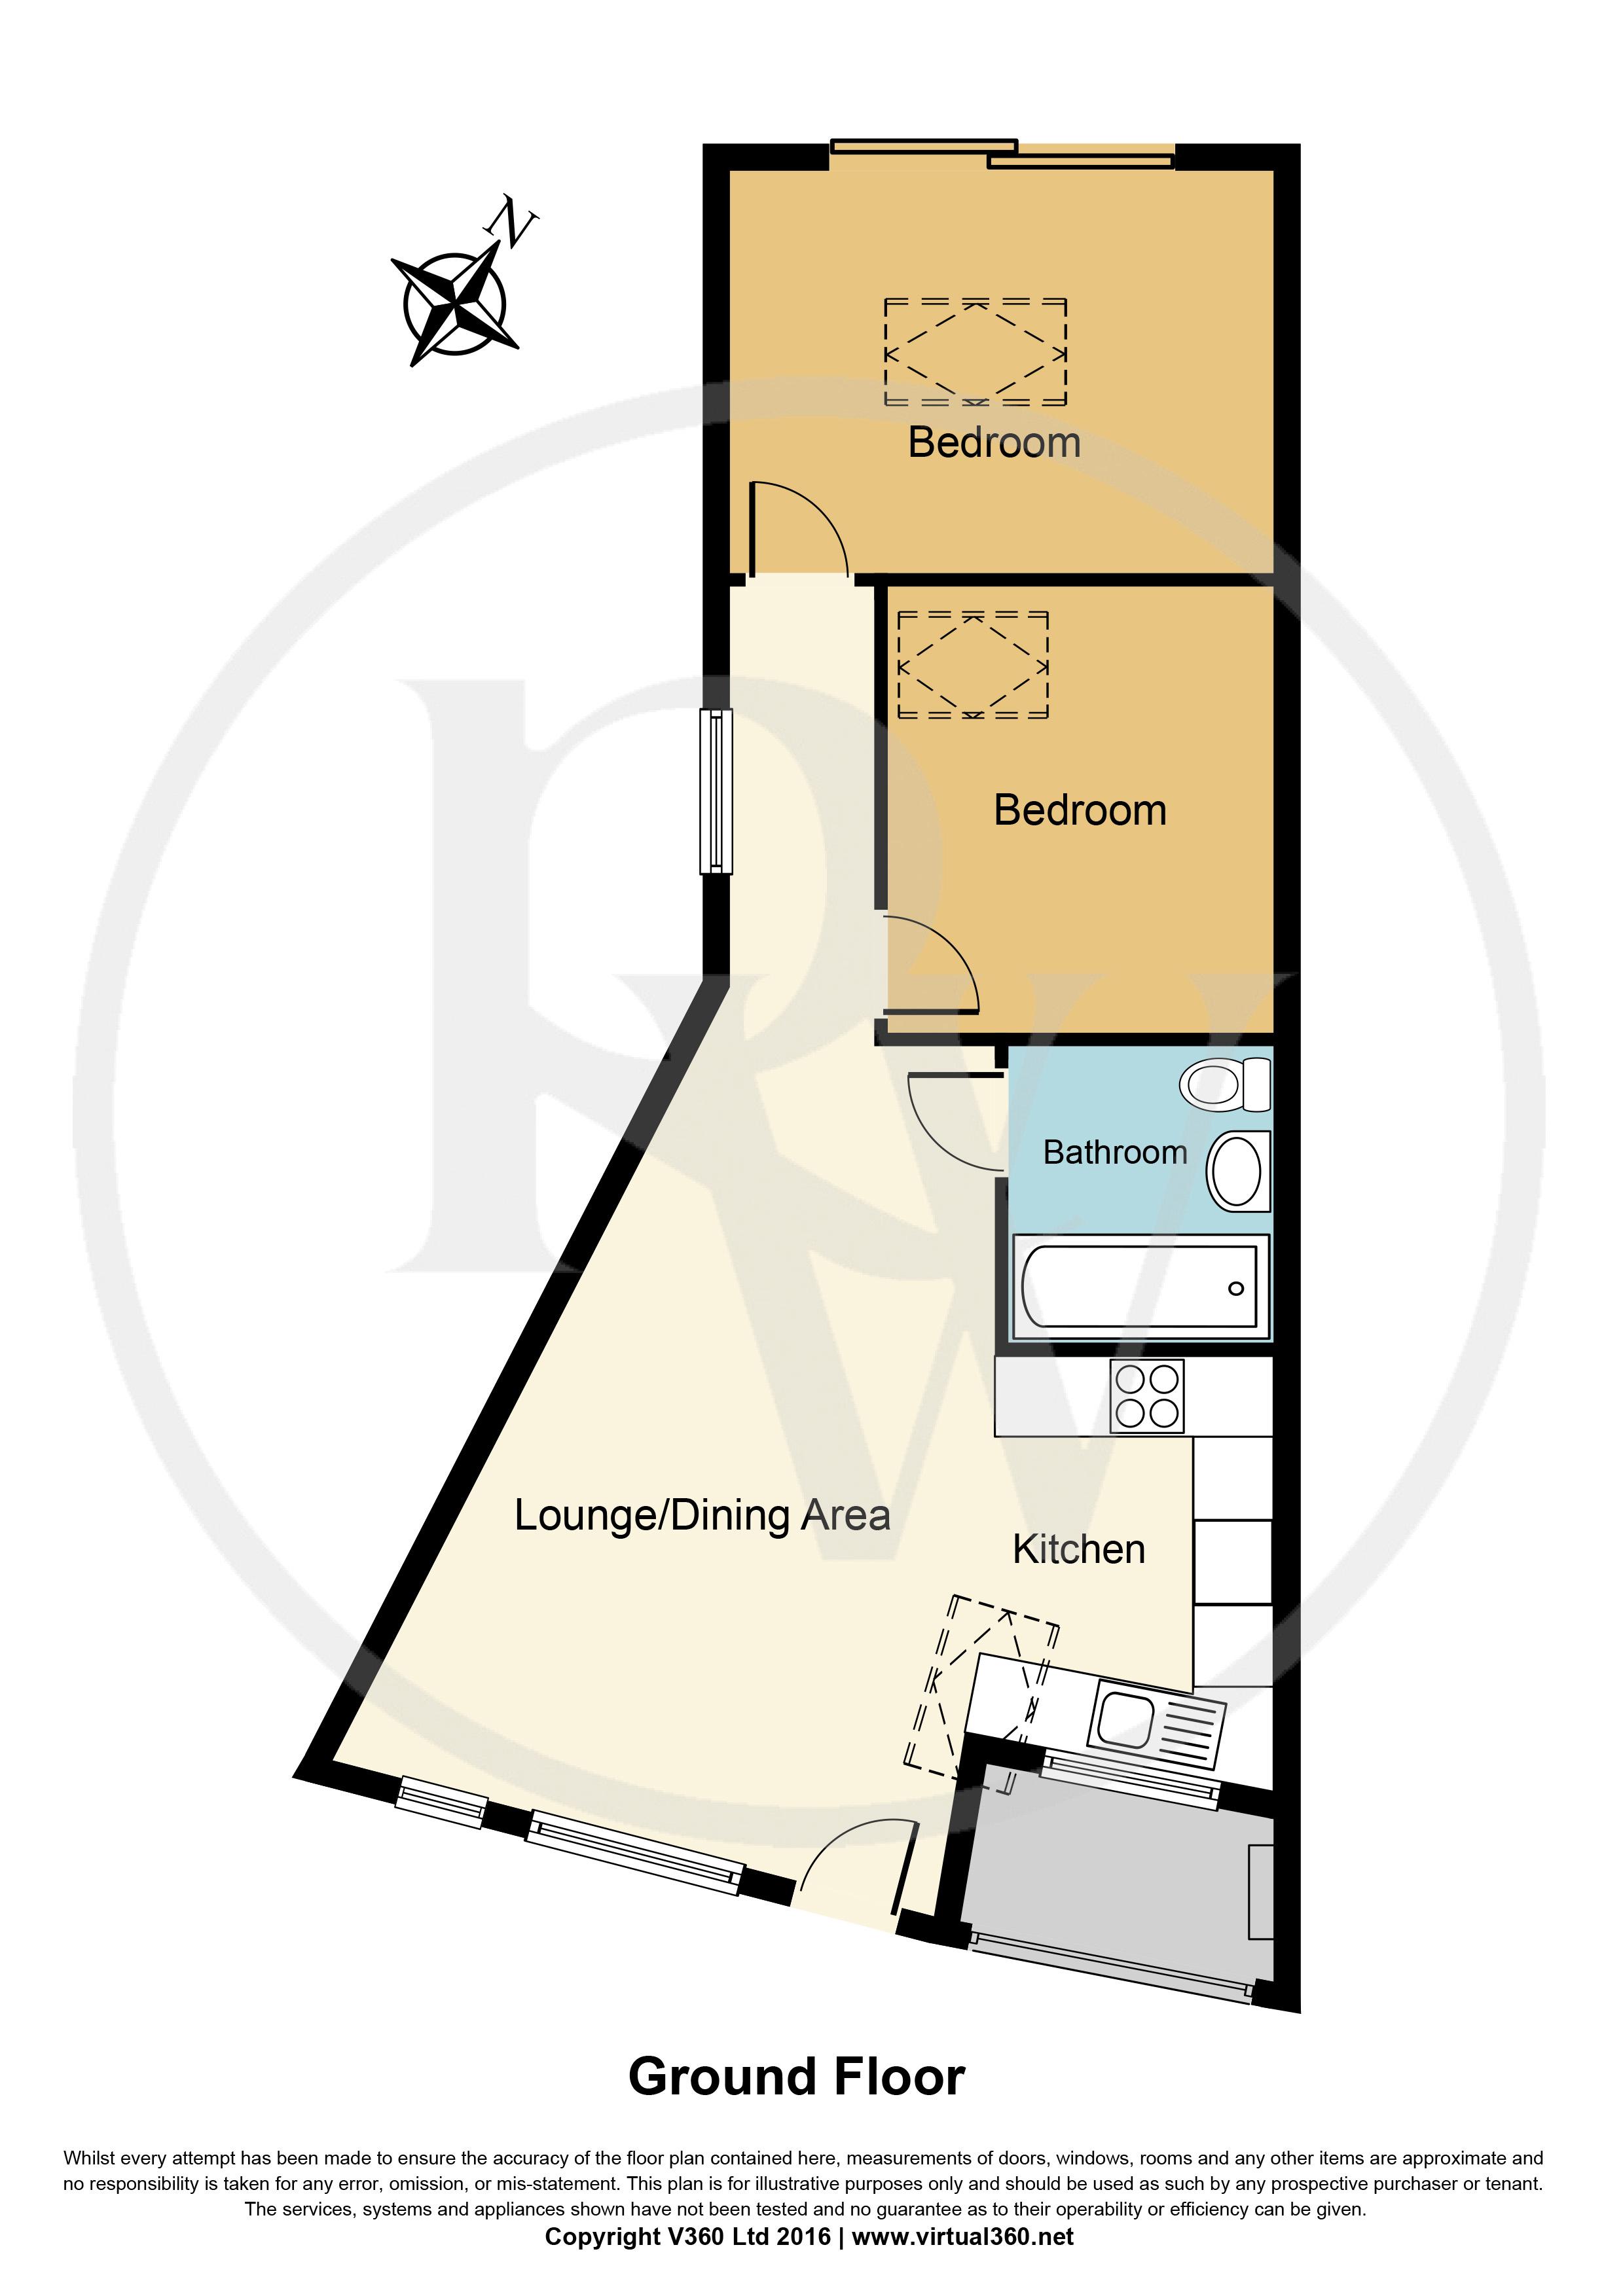 Westfield White City Floor Plan Kiln Cottage Westfield Road Woking Surrey Gu22 2